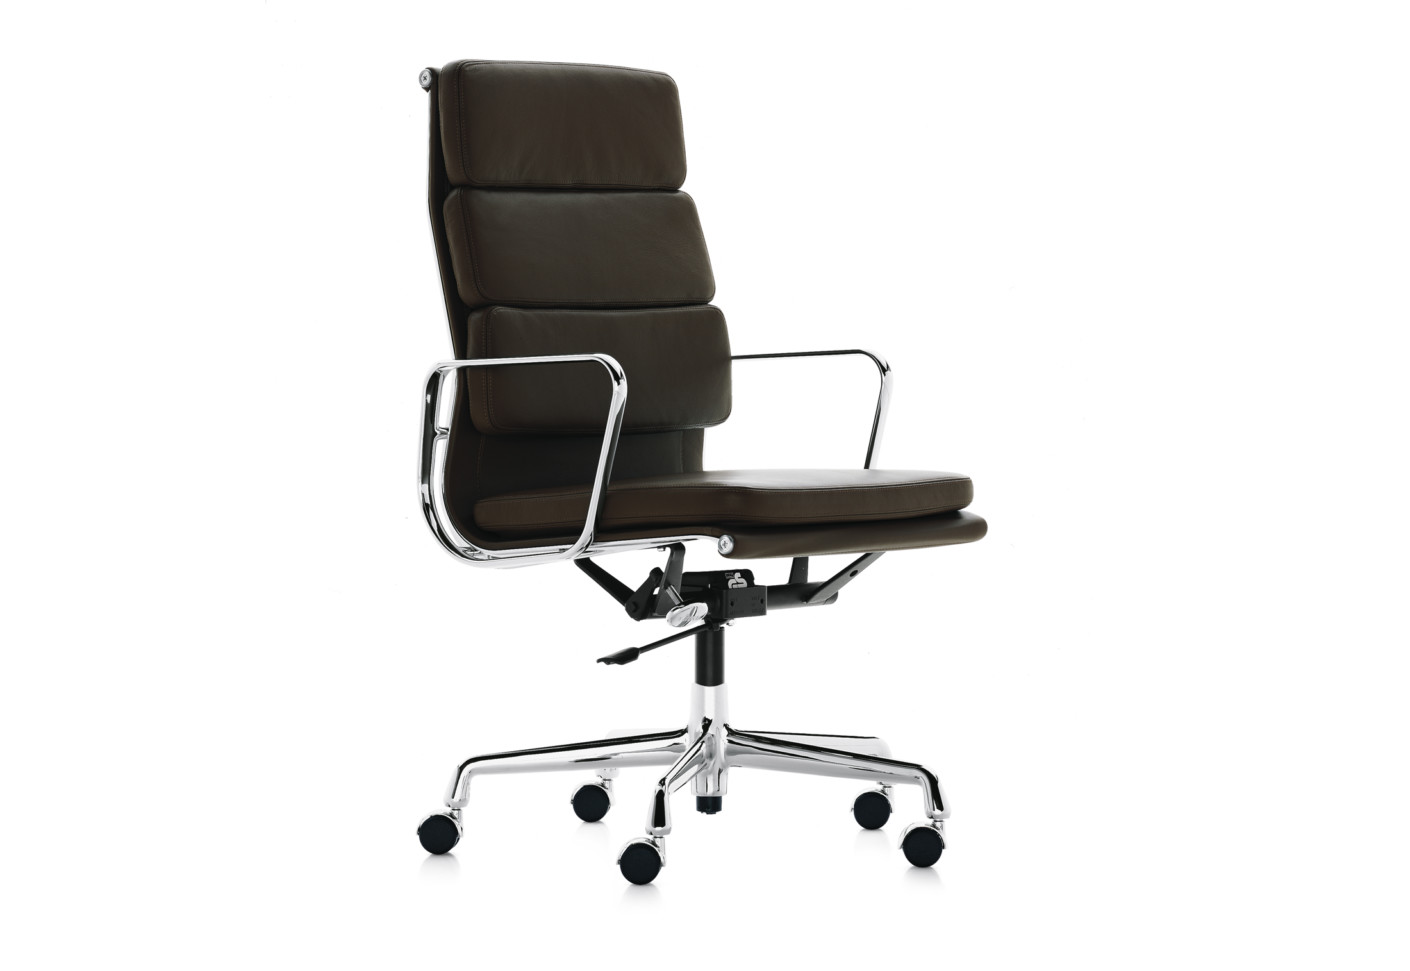 Soft Pad Swivel Chair High By Vitra Stylepark